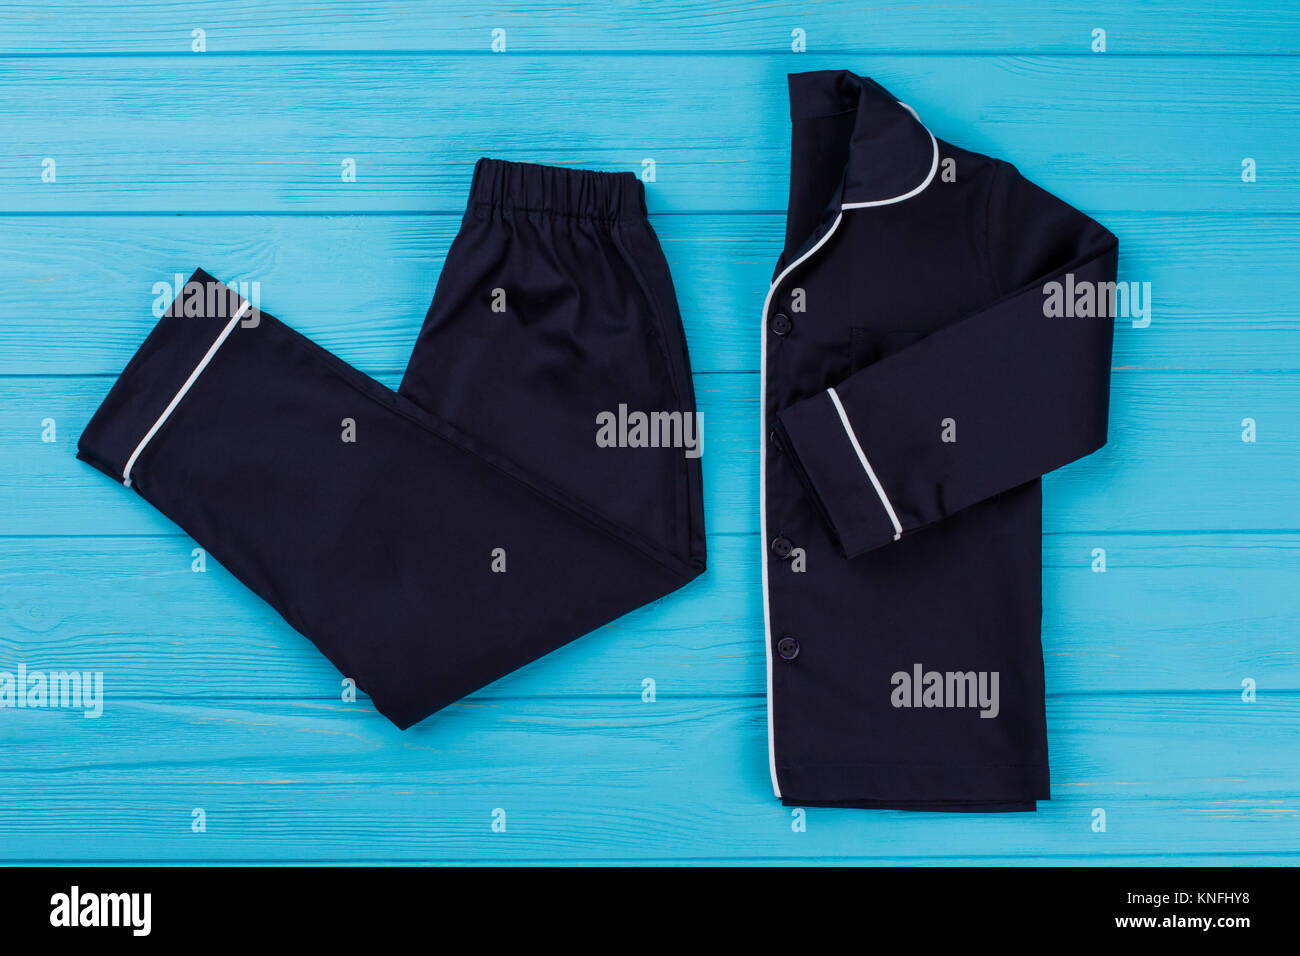 Classic sleepwear set for boys - Stock Image